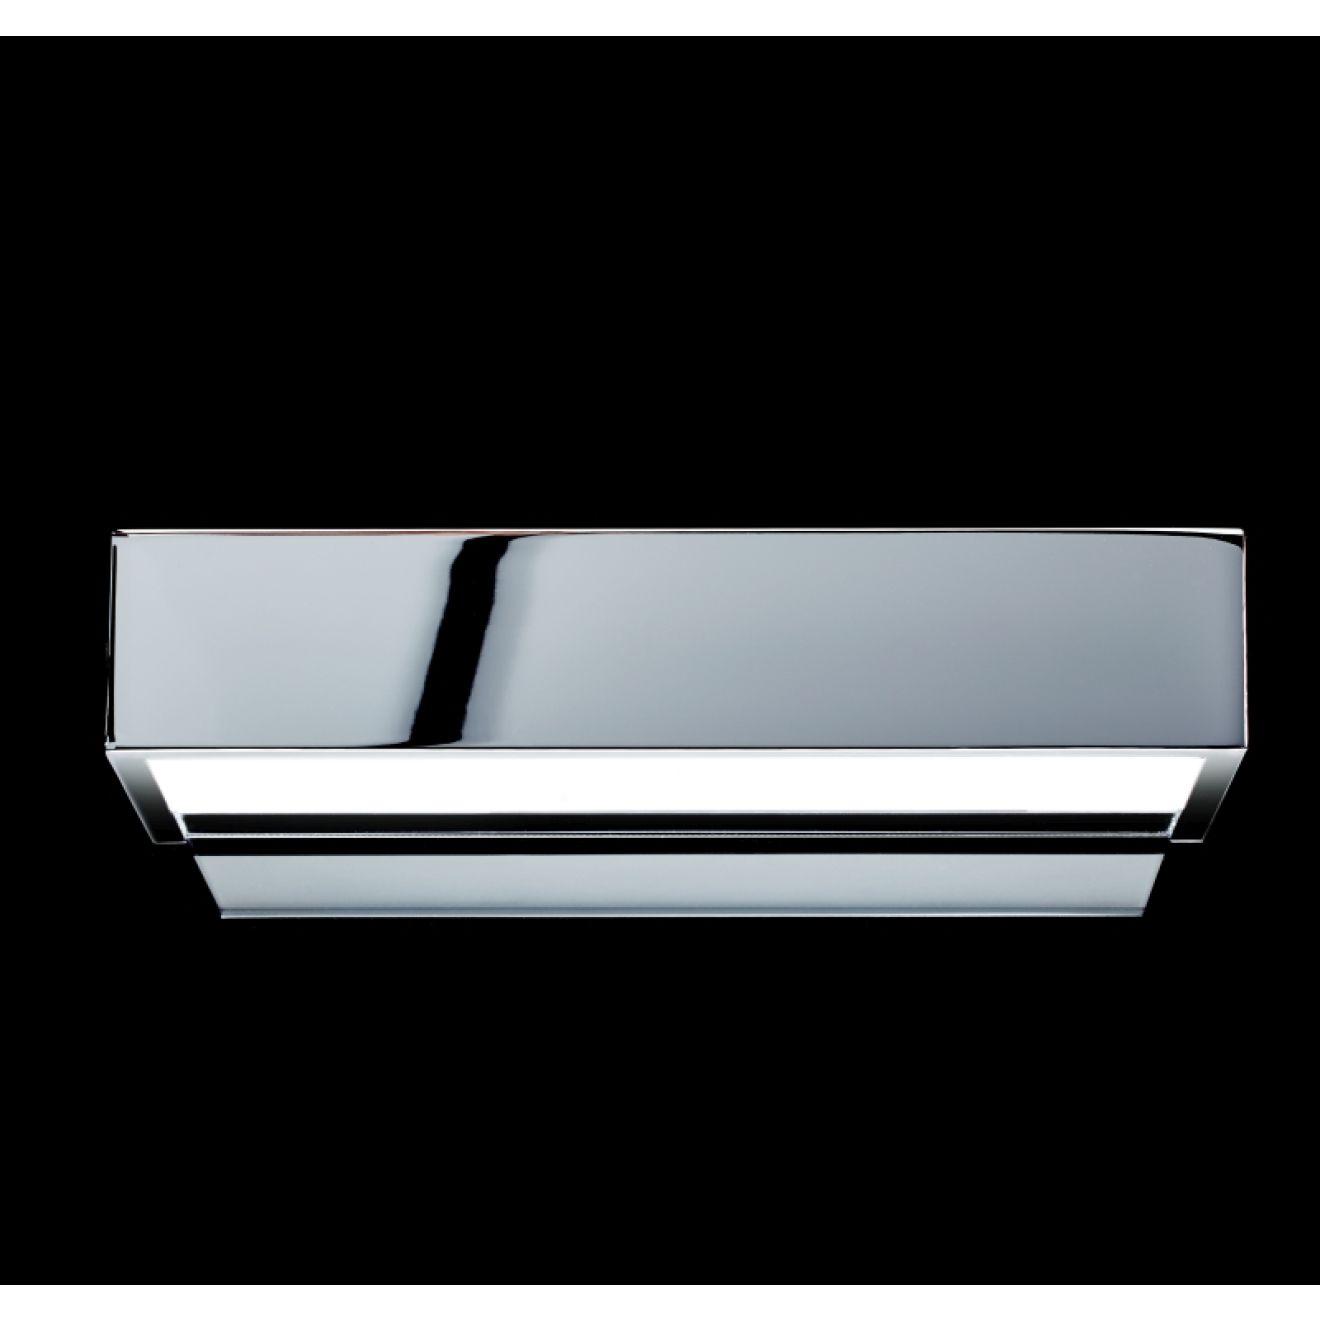 decor walther box 1 40 led spiegelleuchte 417500. Black Bedroom Furniture Sets. Home Design Ideas